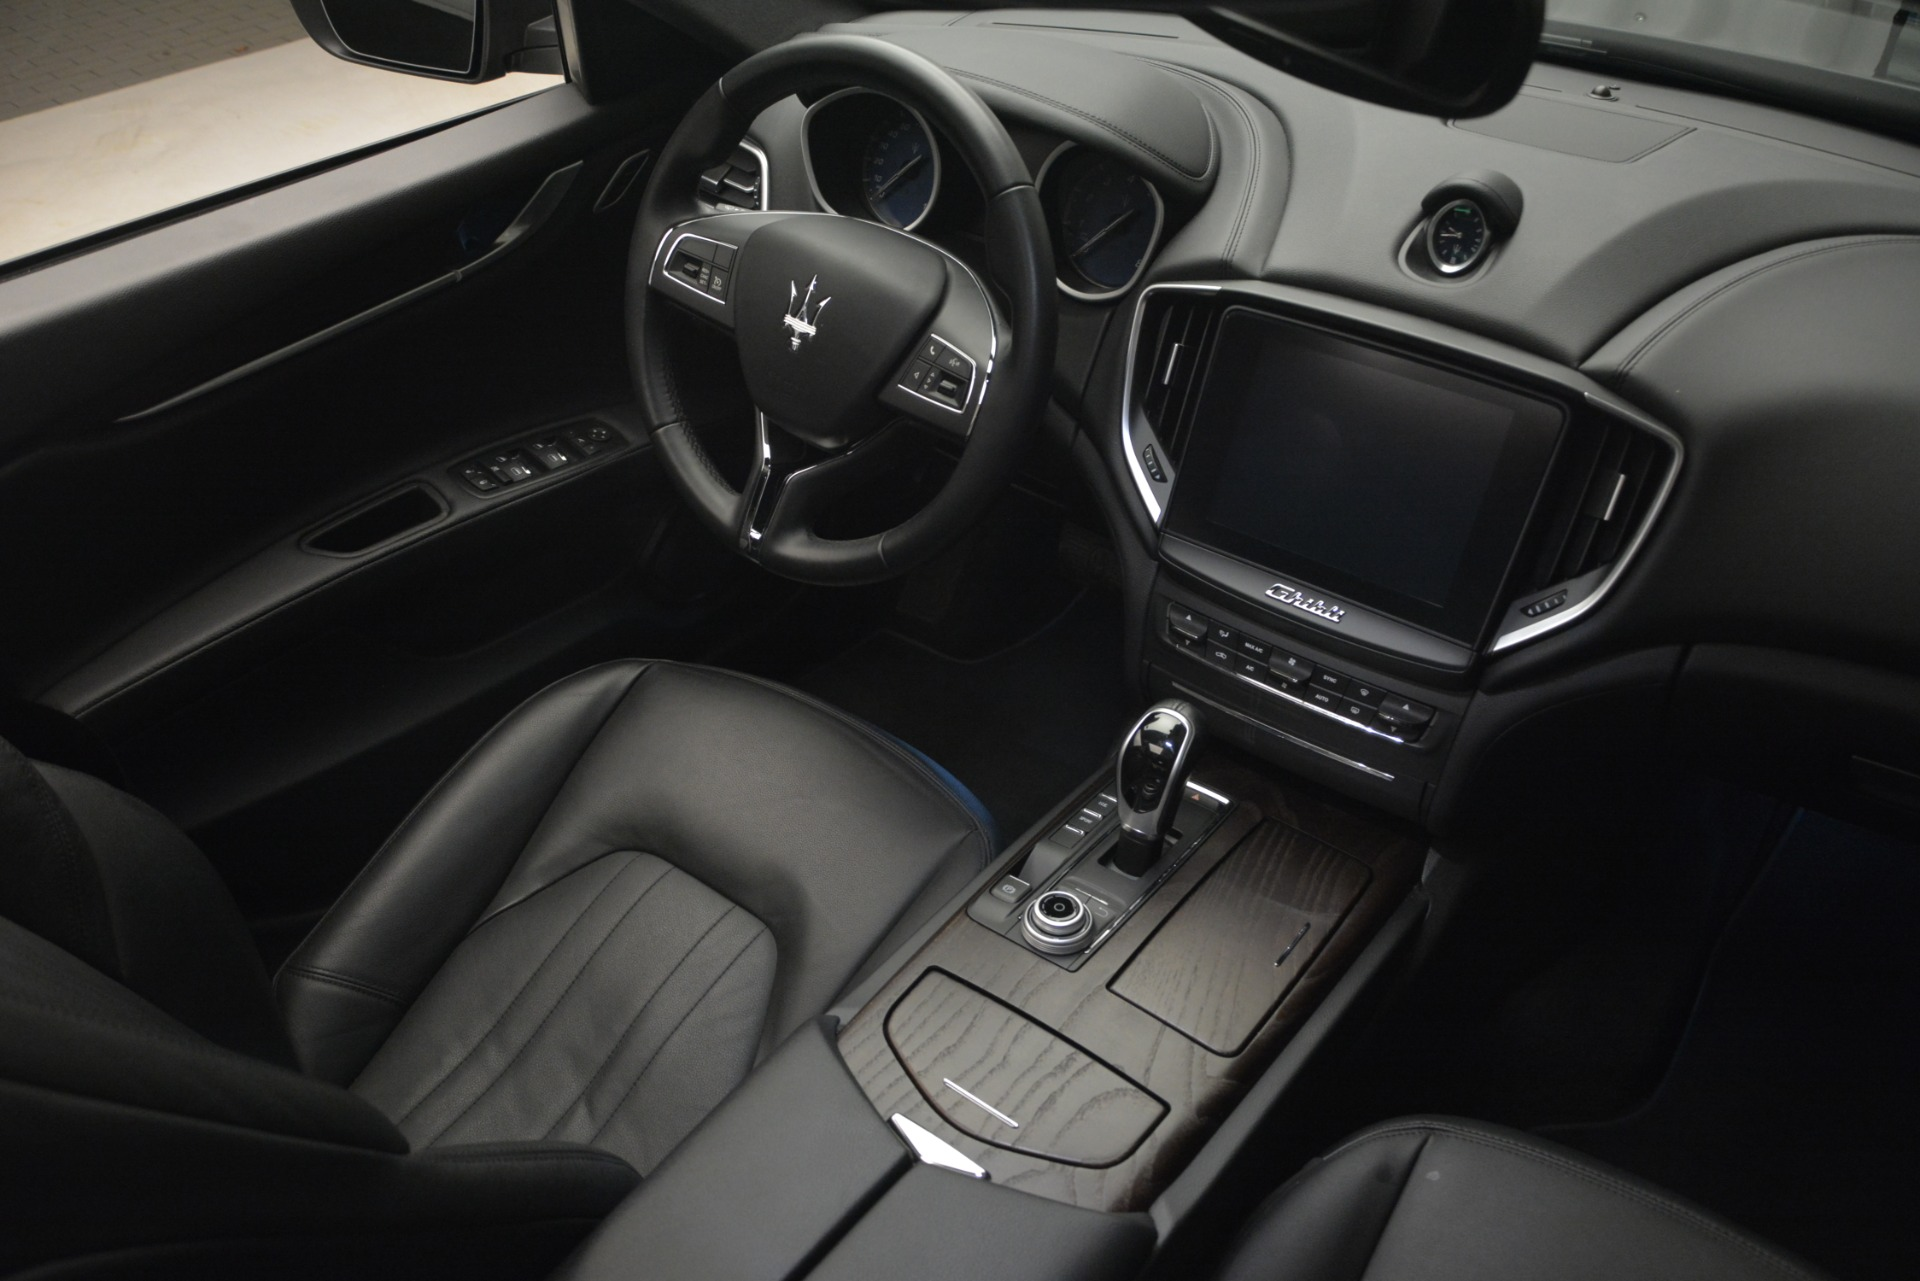 Used 2018 Maserati Ghibli S Q4 For Sale In Greenwich, CT 2944_p19